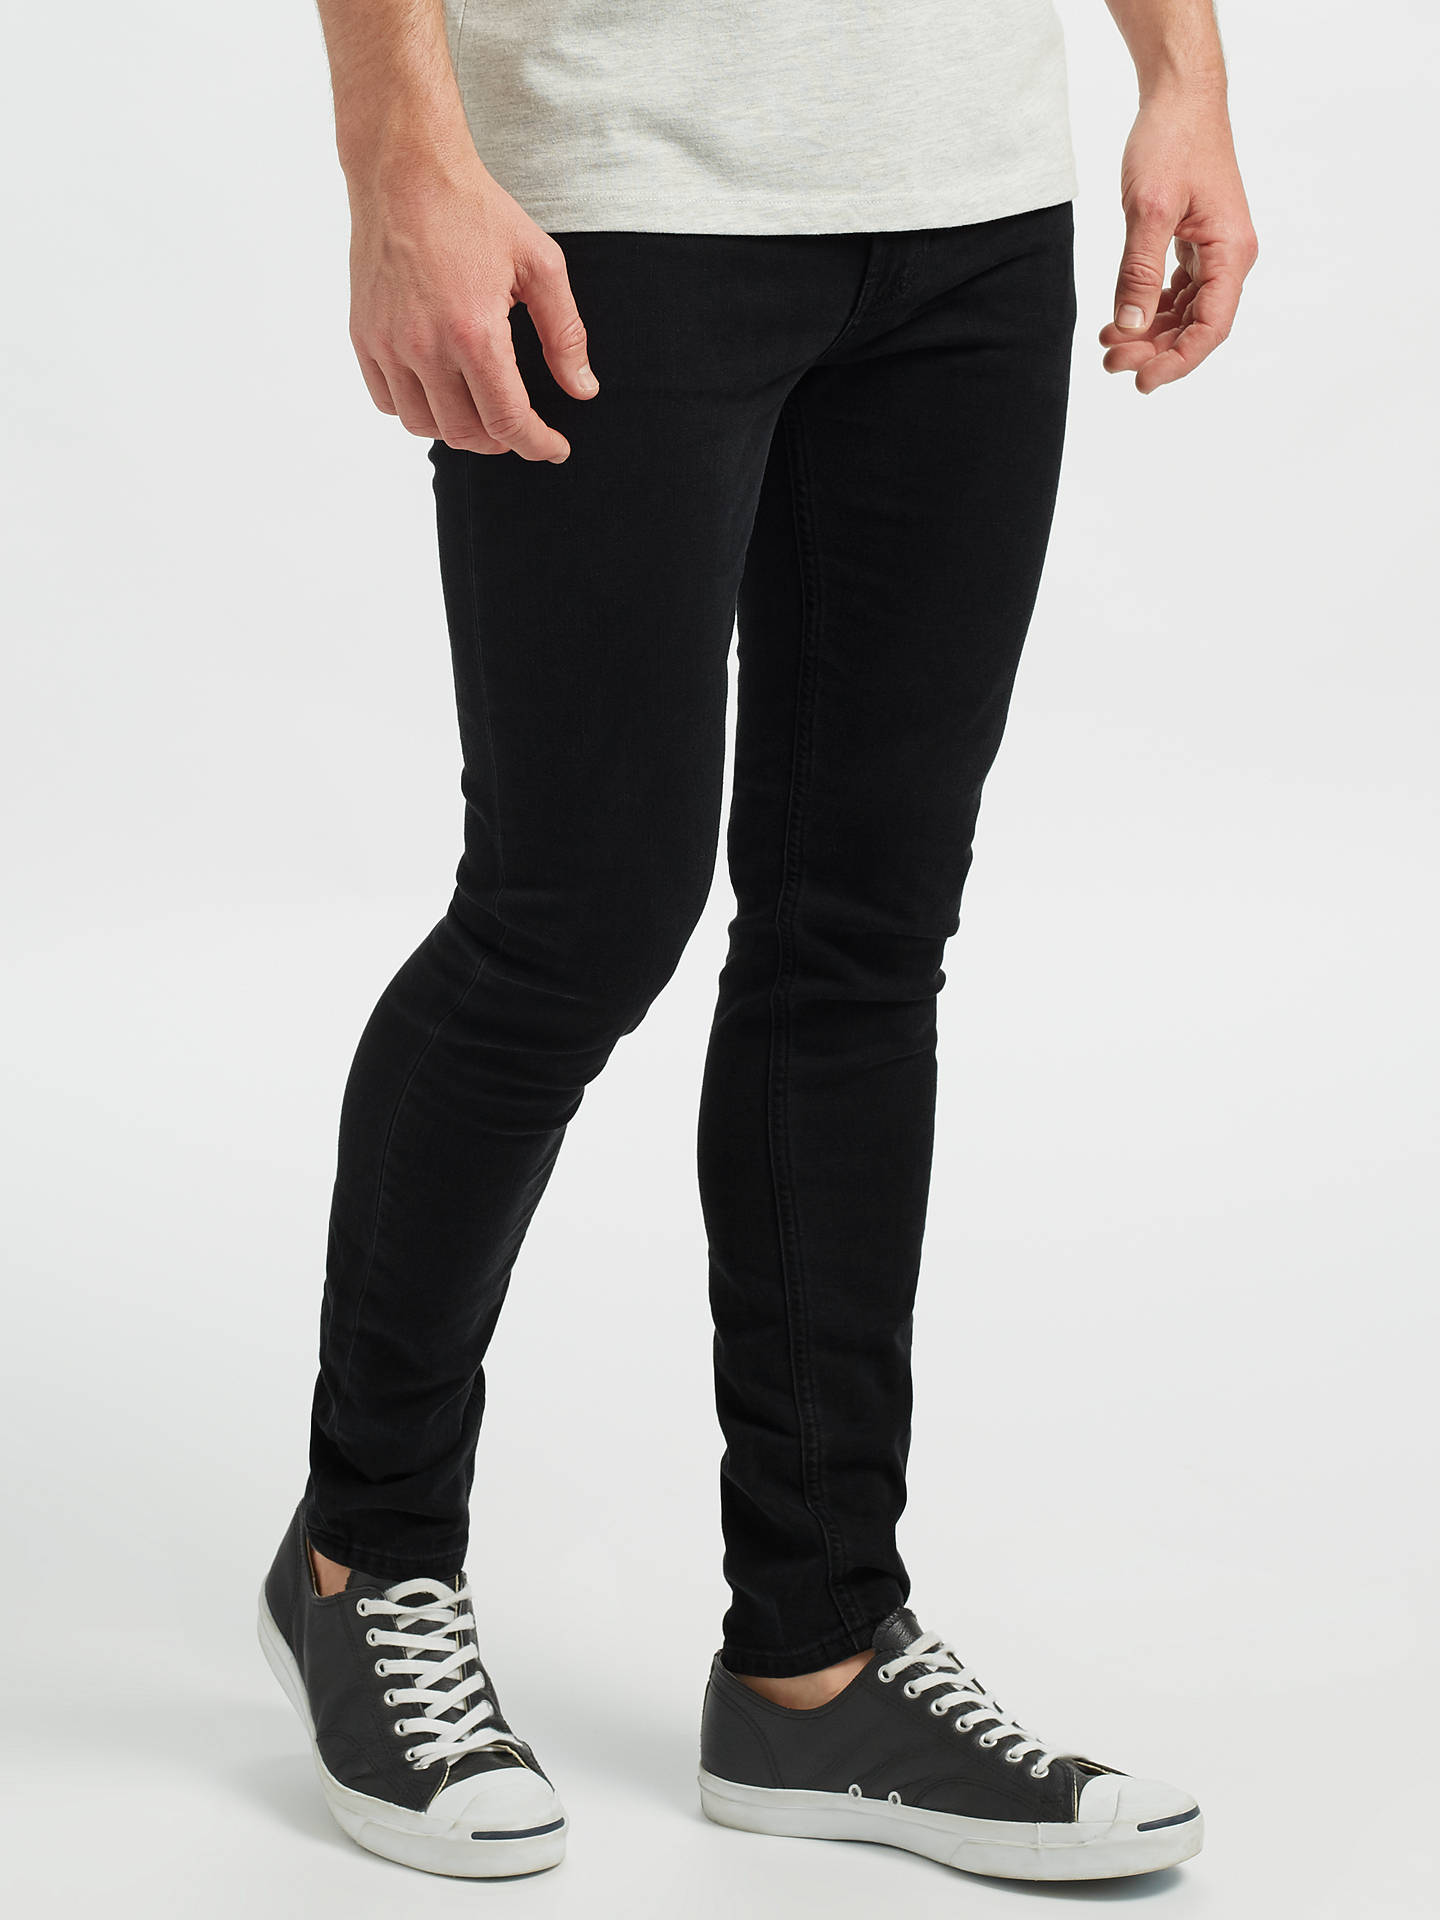 4bb1e75c87 Scotch & Soda Skim The Nero Skinny Jeans, Black at John Lewis & Partners